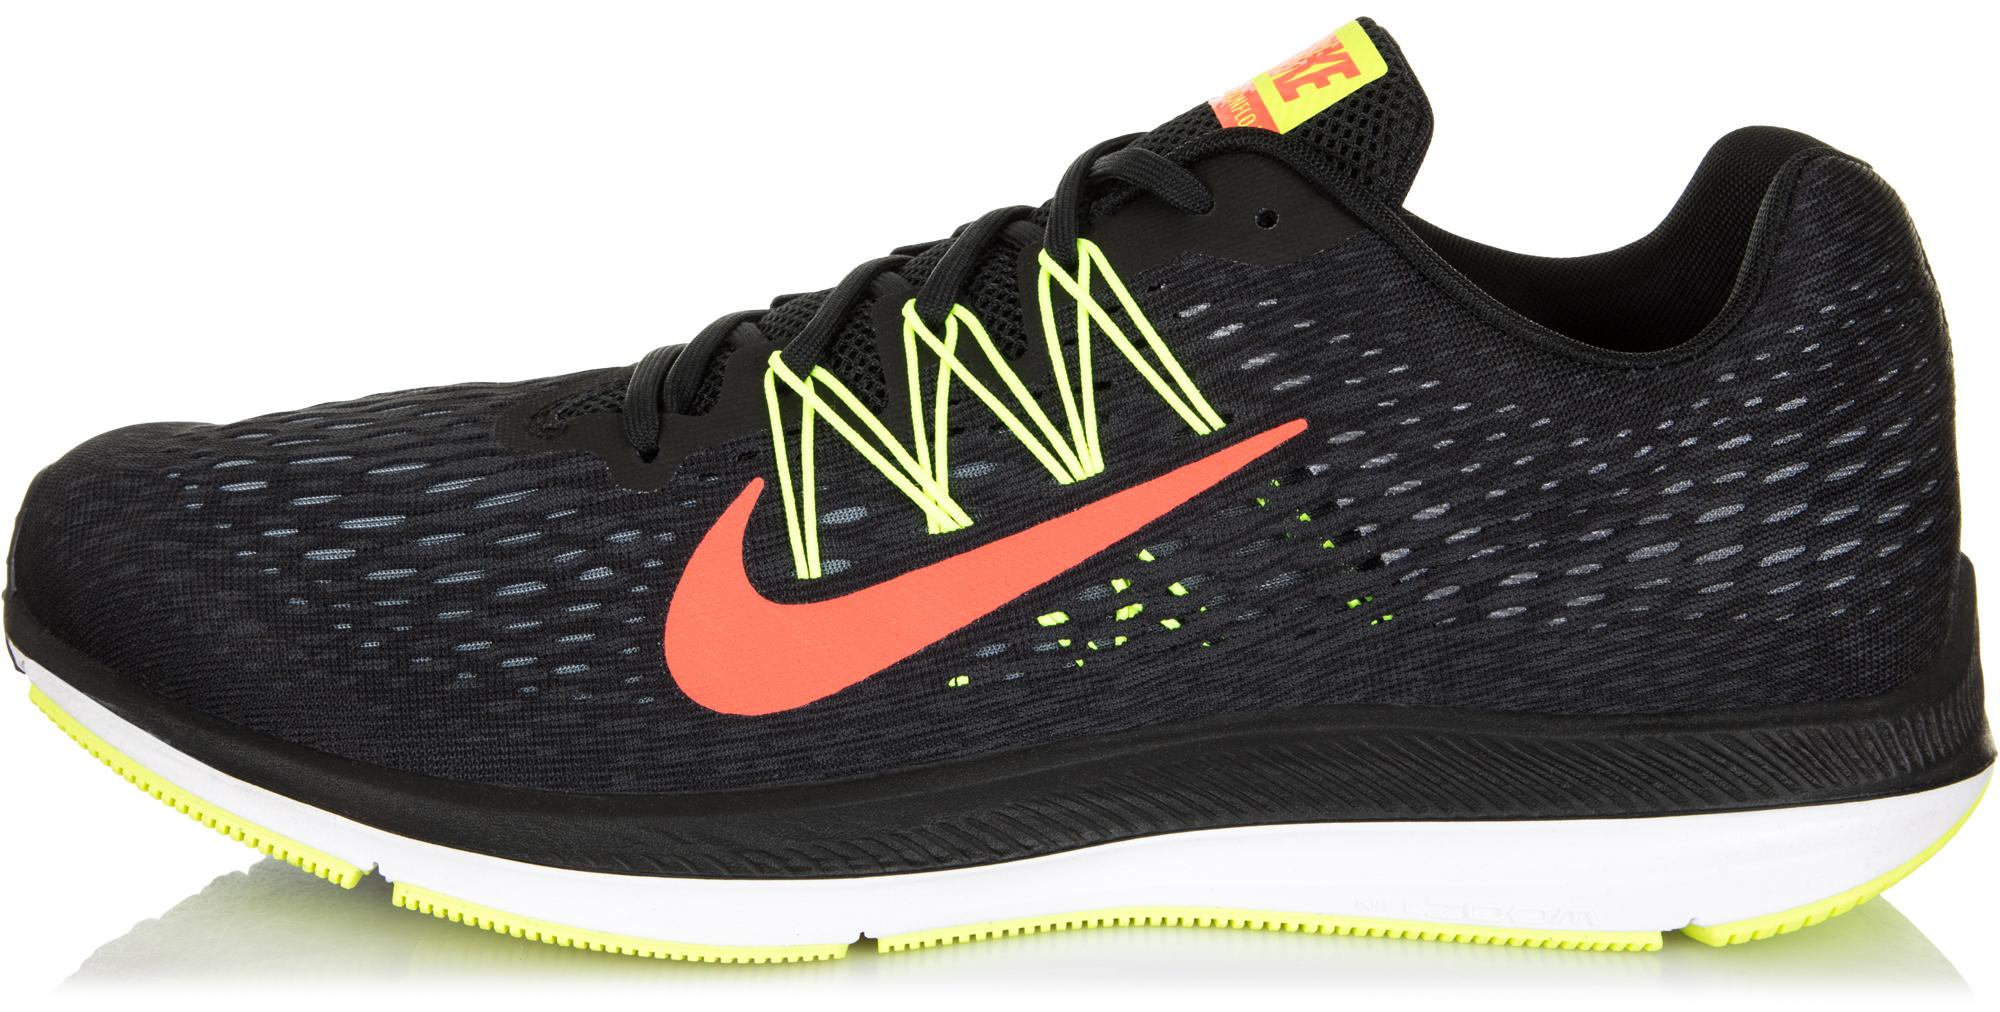 Nike Кроссовки мужские Nike Air Zoom Winflo 5, размер 44 кроссовки jordan мужские кроссовки flight origin 4 921196 004 8 5